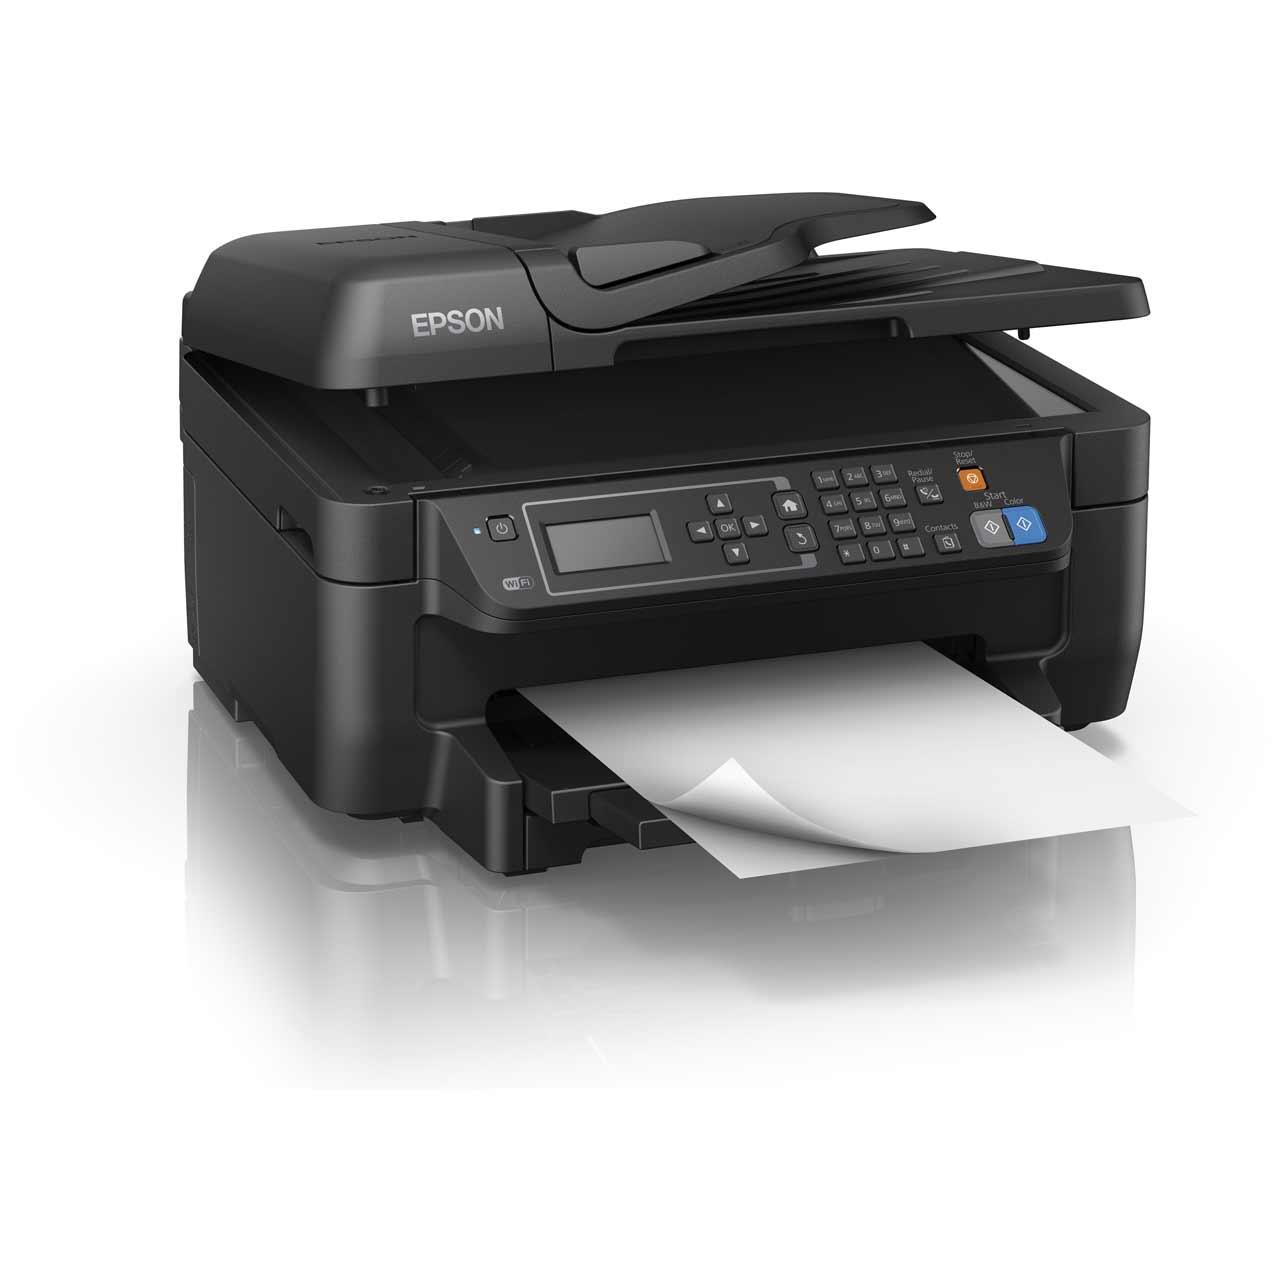 Epson WorkForce WF2750 Inkjet Printer - Black